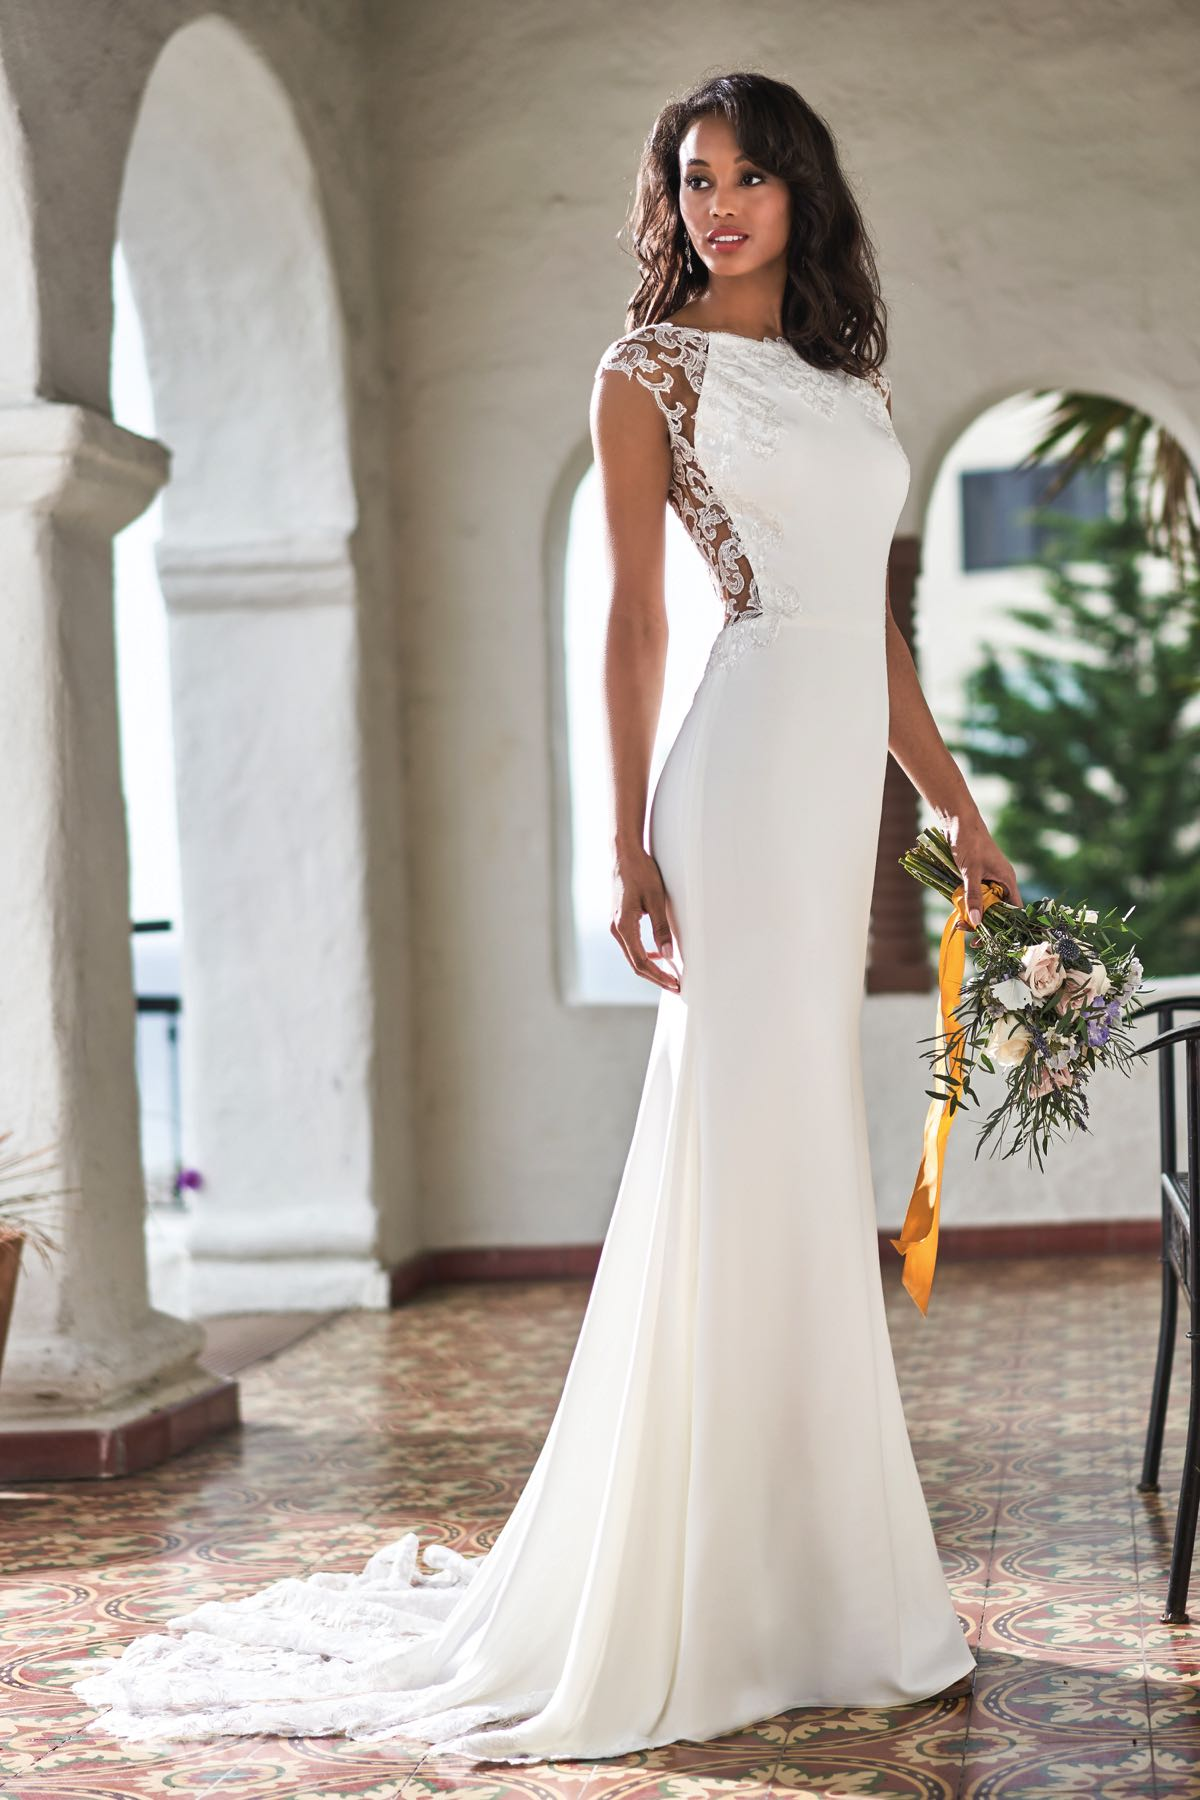 T212052 Romantic Sequin Lace Amp Stretch Crepe Wedding Dress